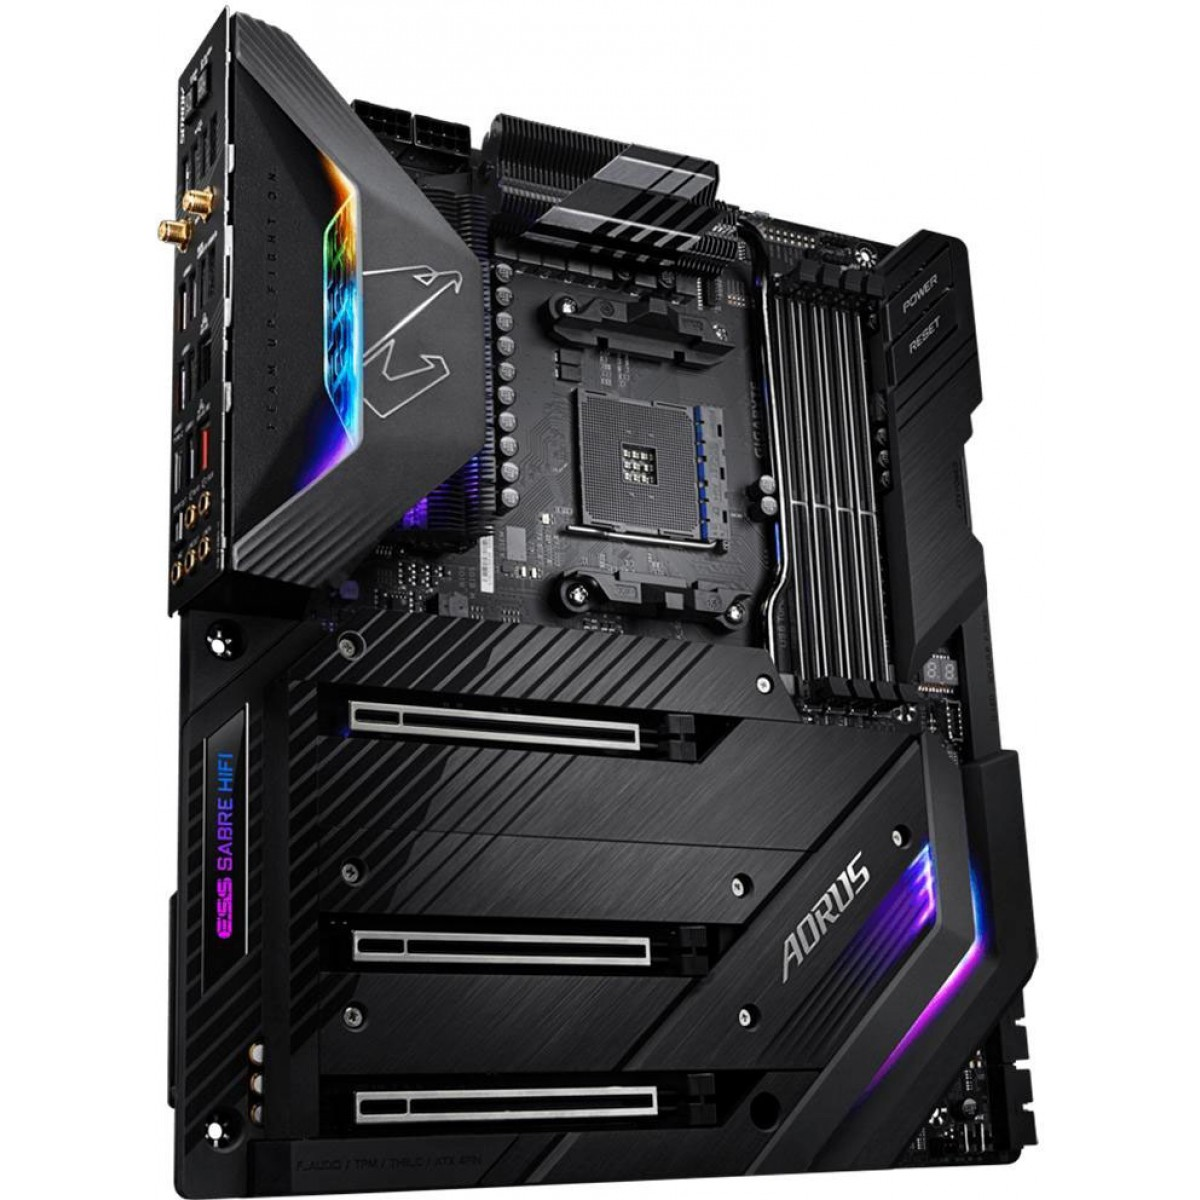 Placa Mãe Gigabyte X570 Aorus Xtreme, Chipset X570, AMD AM4, eATX, DDR4